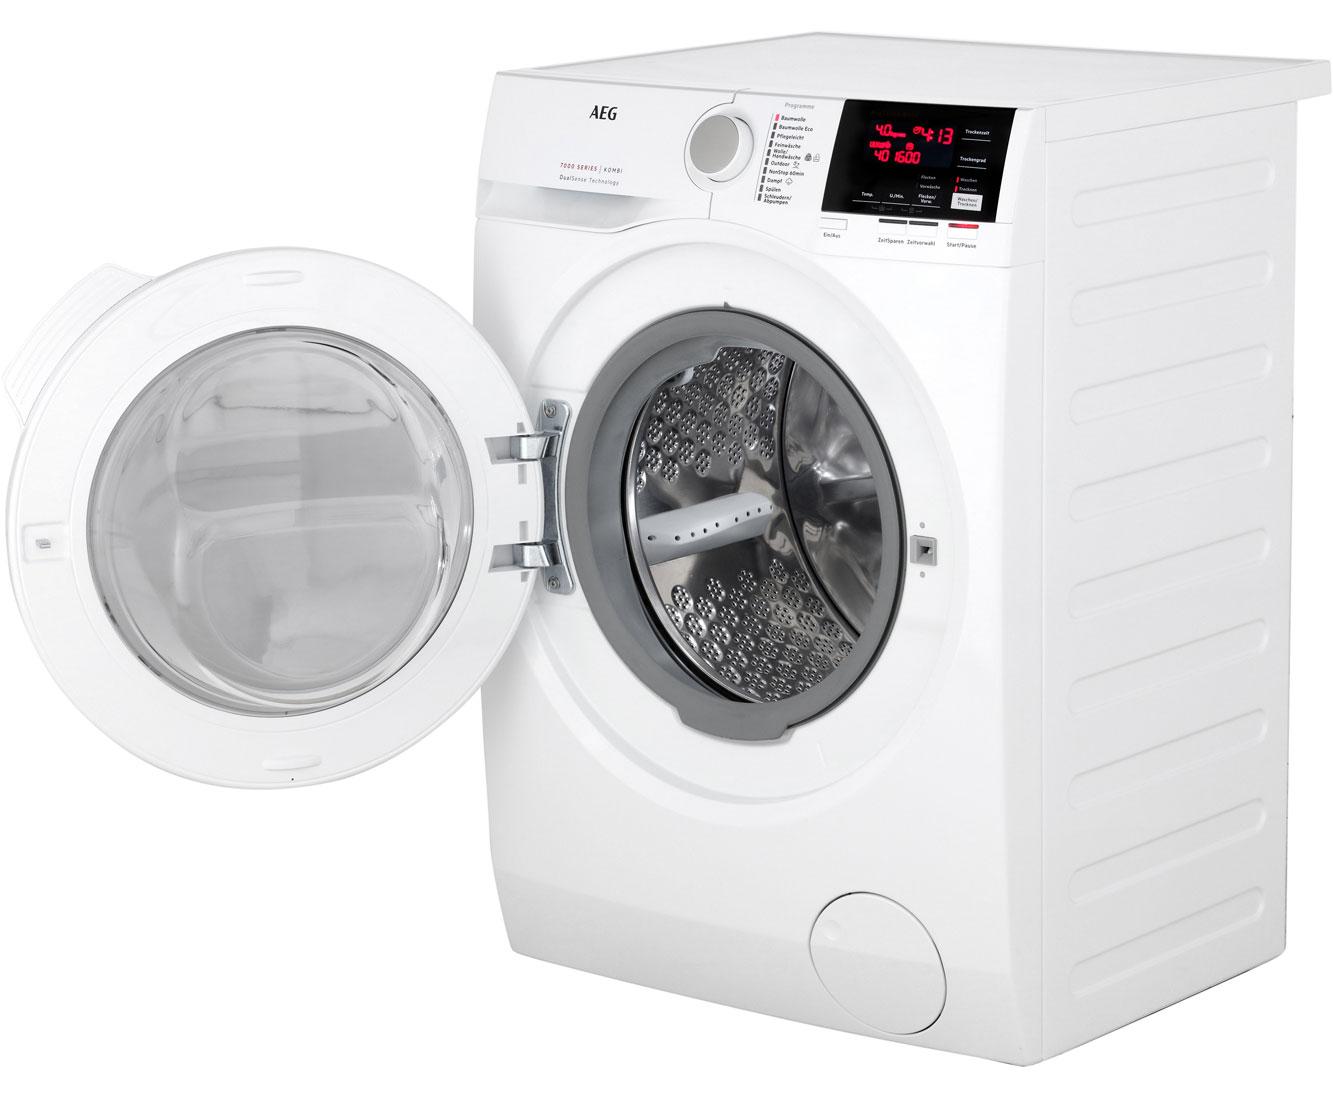 Aeg l wb lavamat kombi waschtrockner freistehend weiss neu ebay